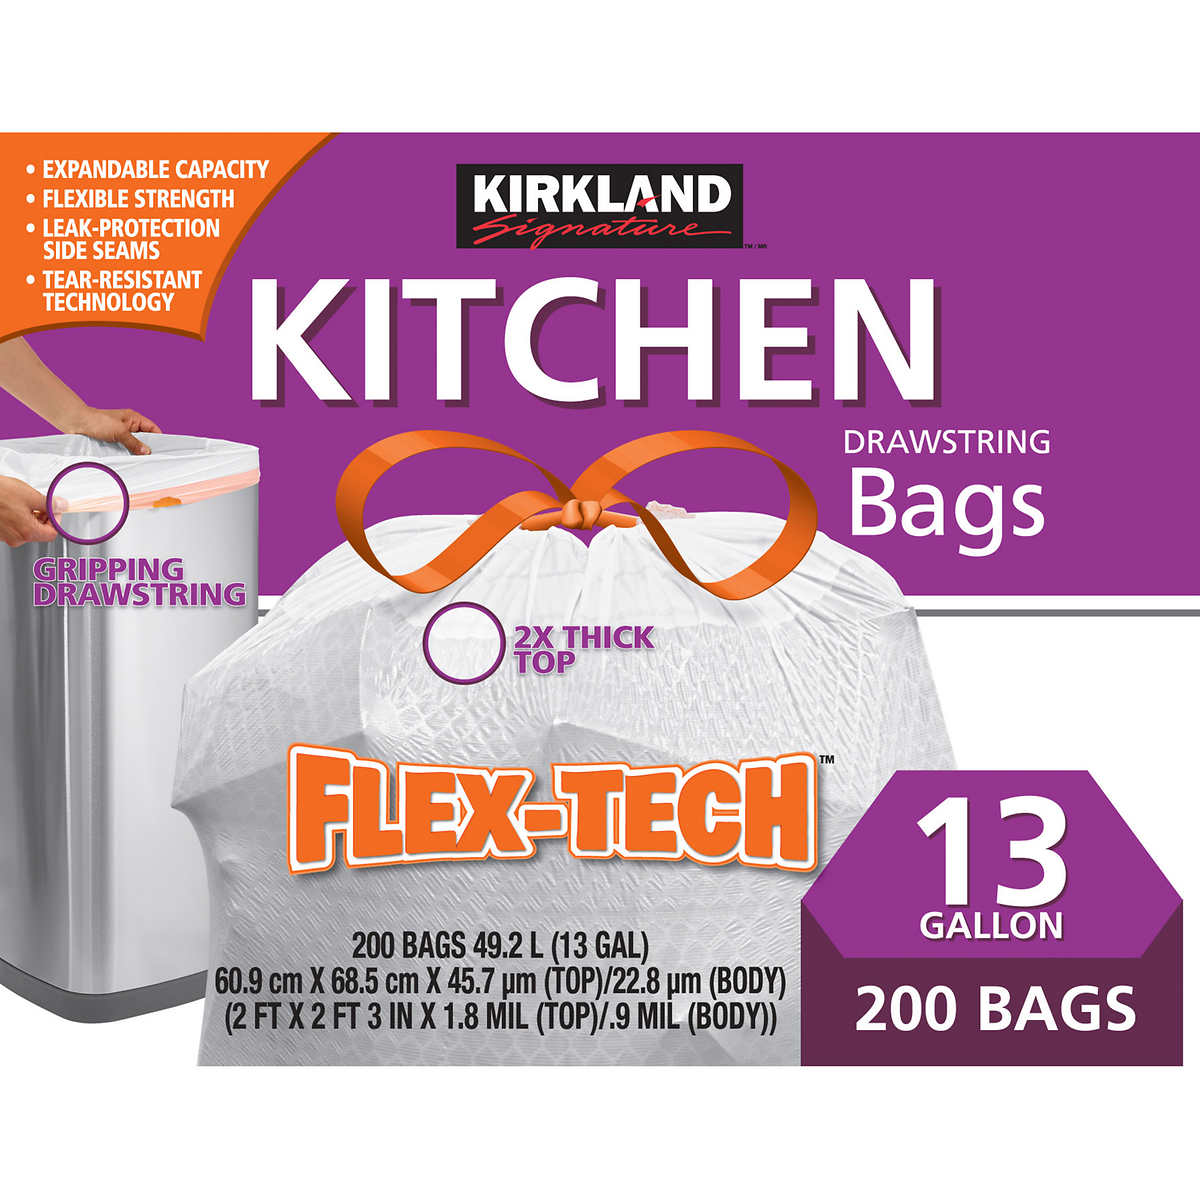 Kirkland Signature Drawstring Kitchen Trash Bags 13 Gallon